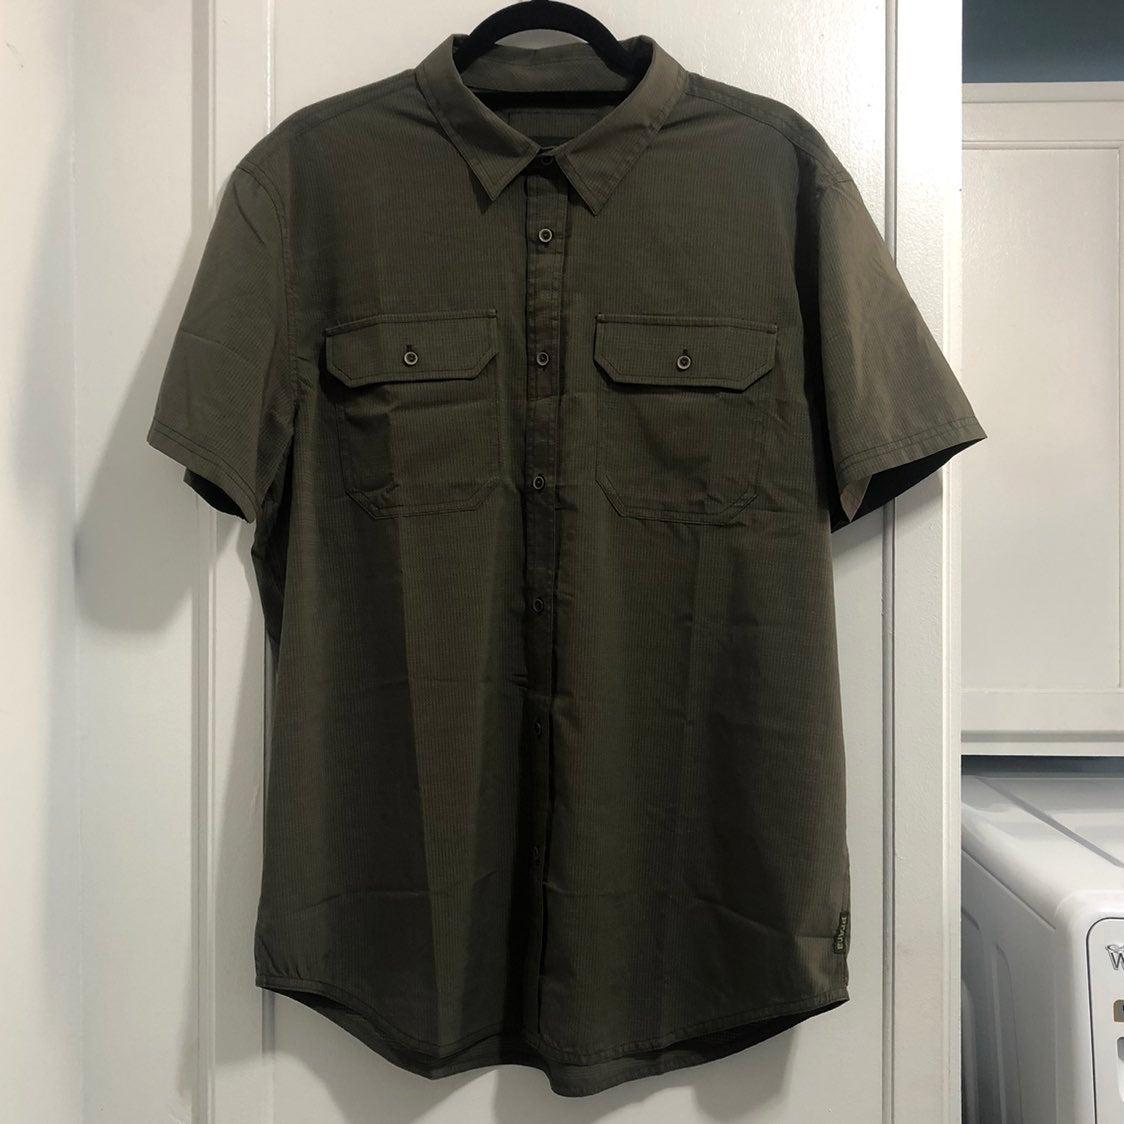 NWOT Prana Button Down Shirt Size Large